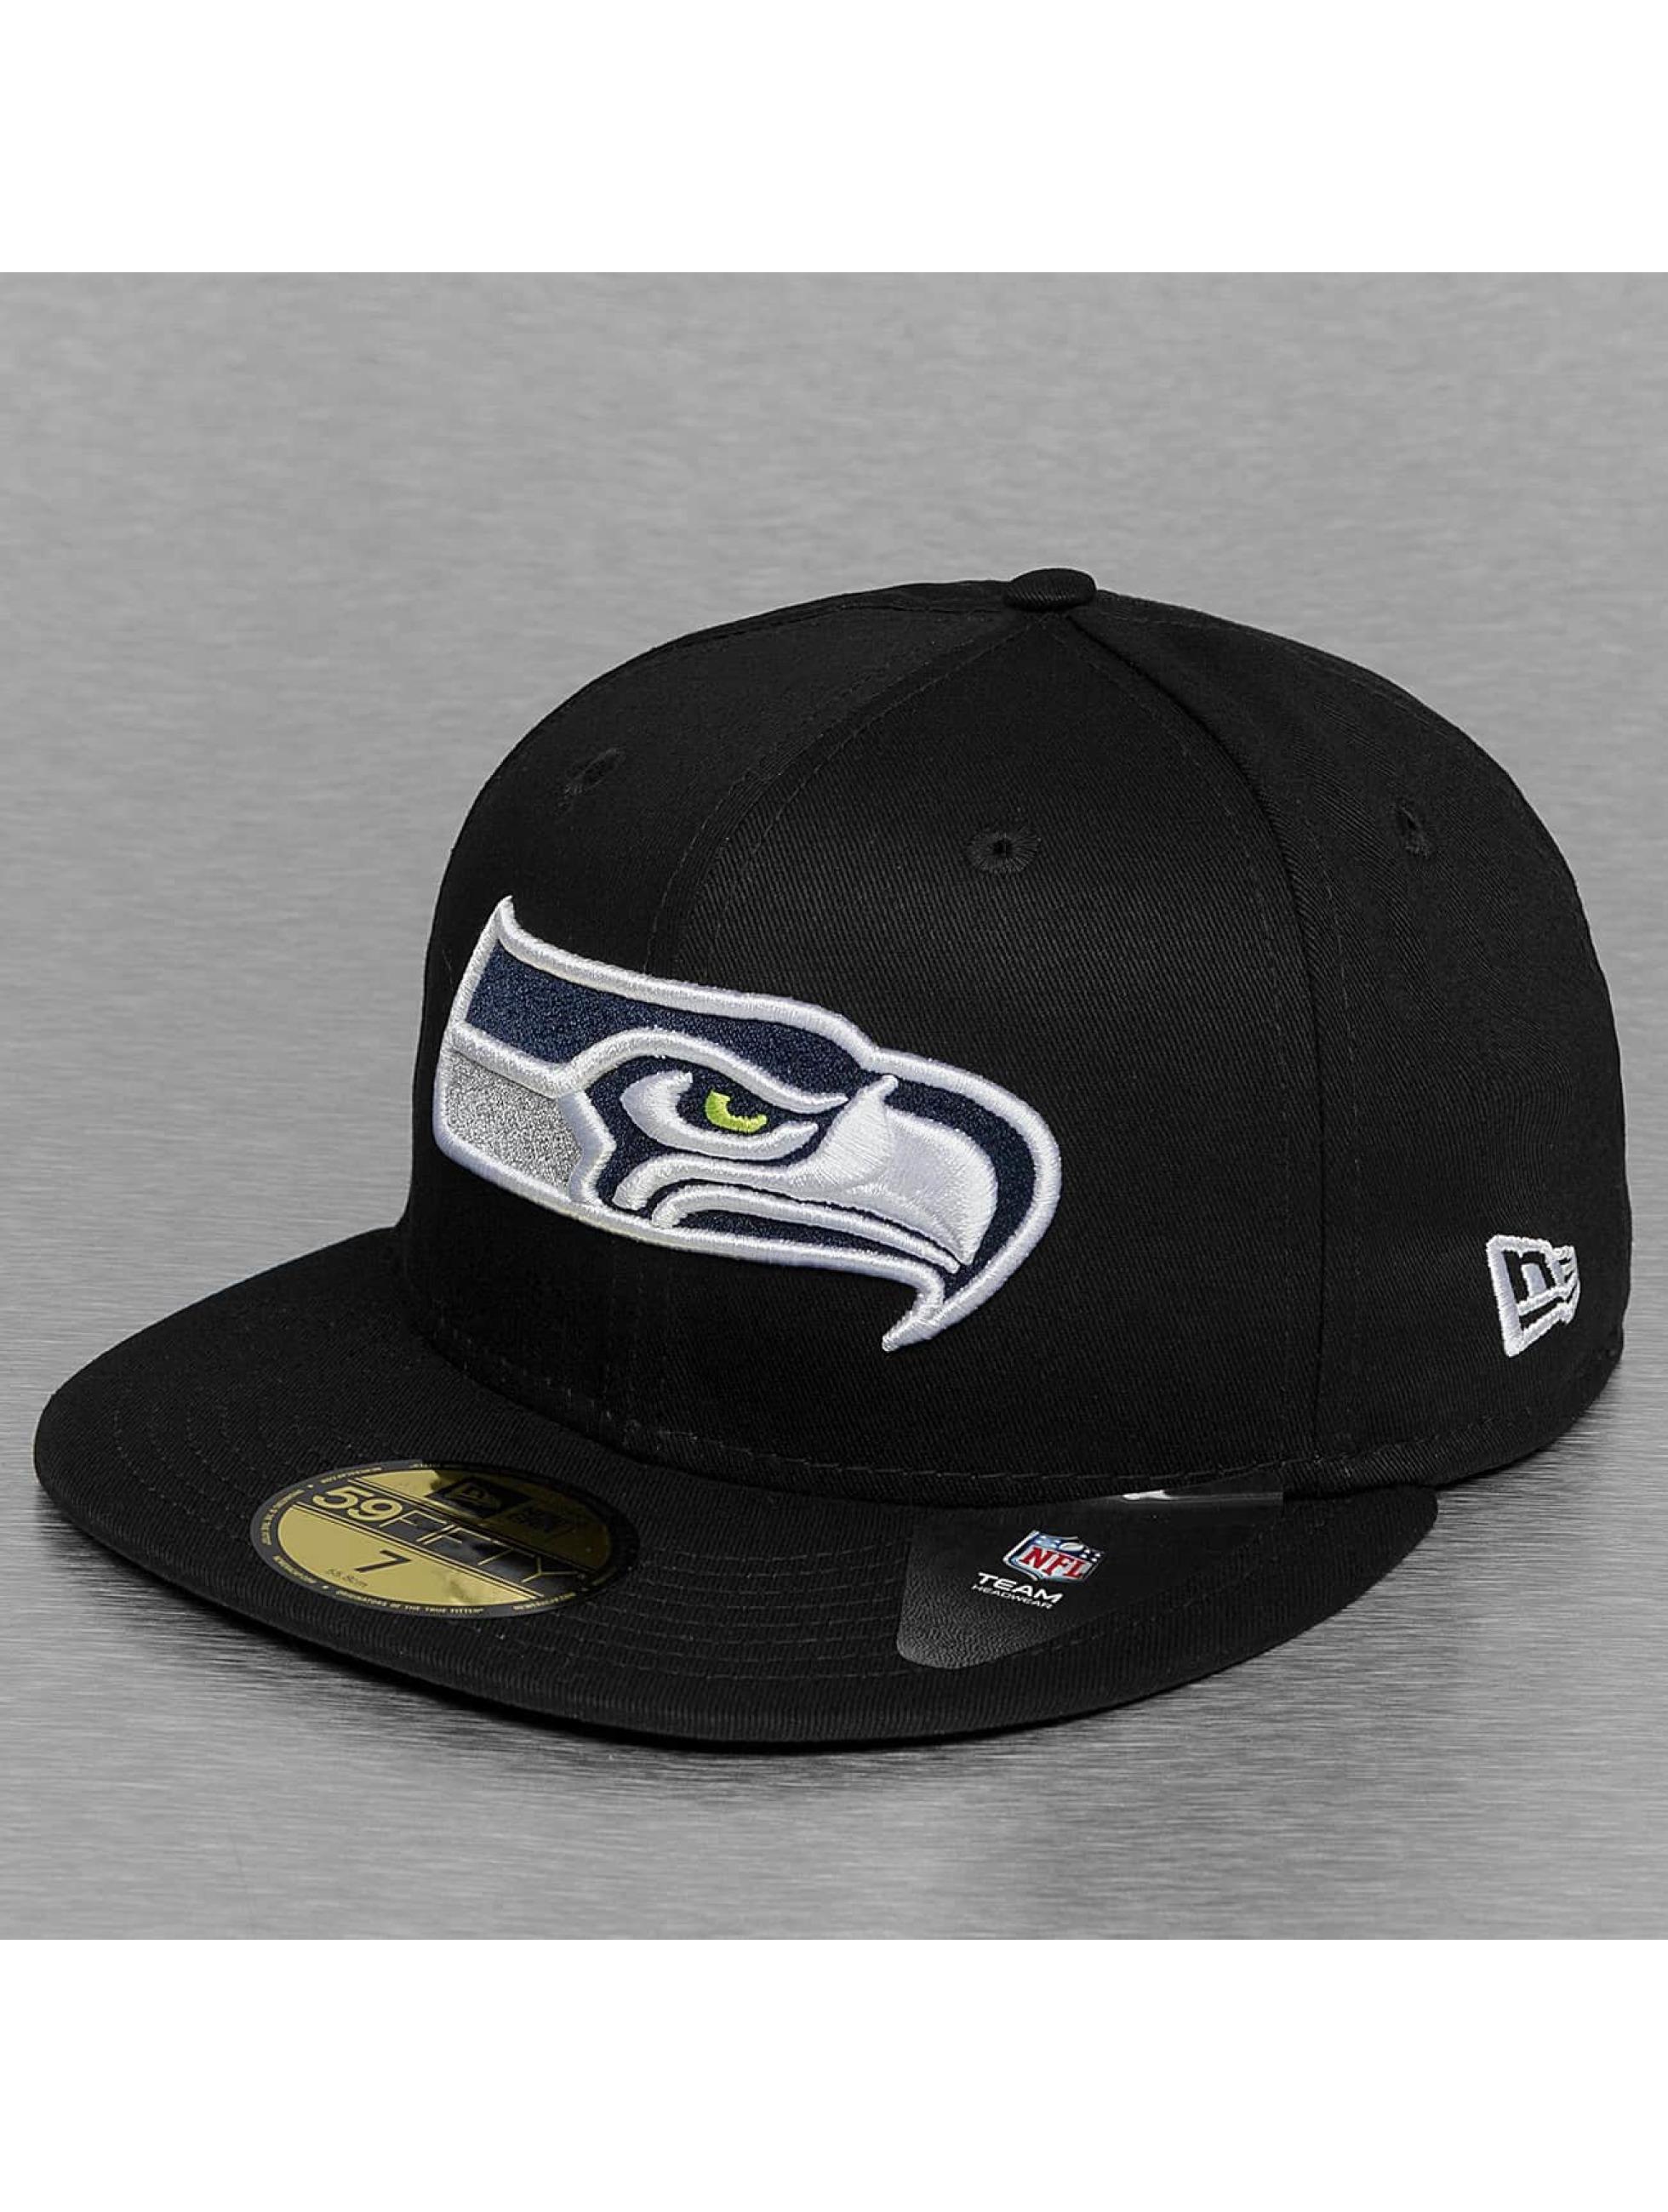 New Era Fitted Cap Black Base Seattle Seahawks black